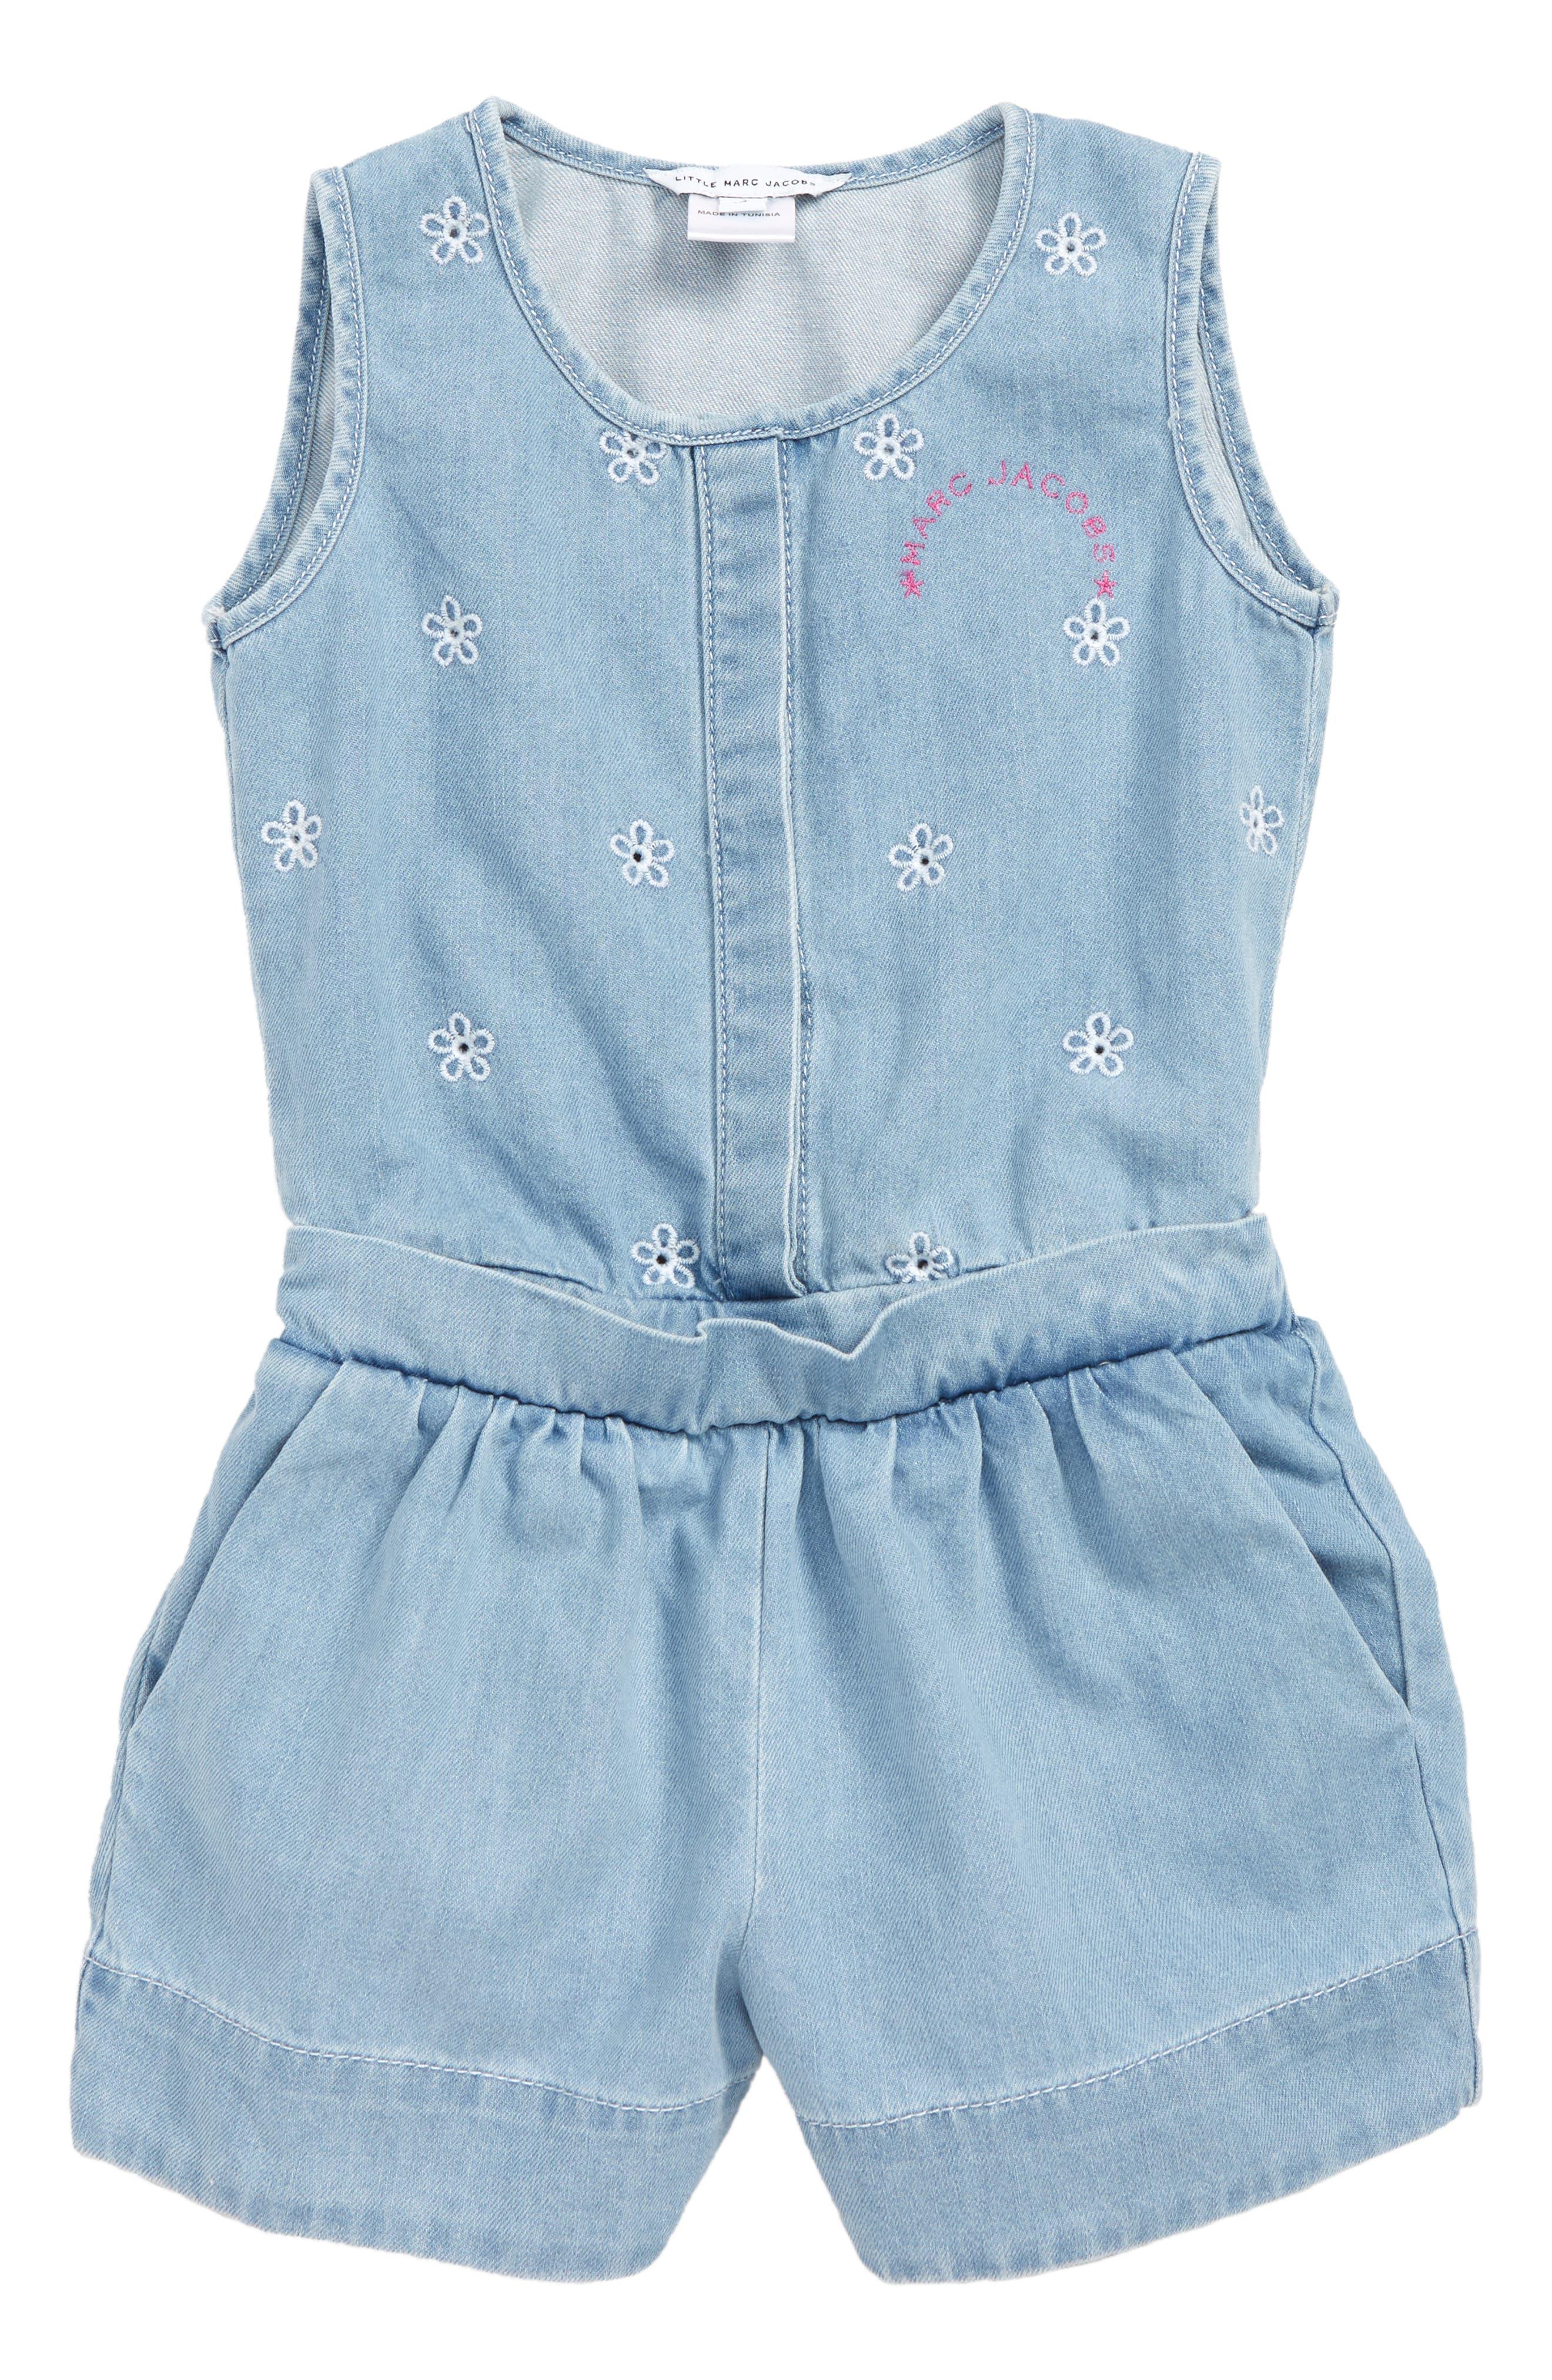 38a57a09fe0 Kids  LITTLE MARC JACOBS Apparel  T-Shirts